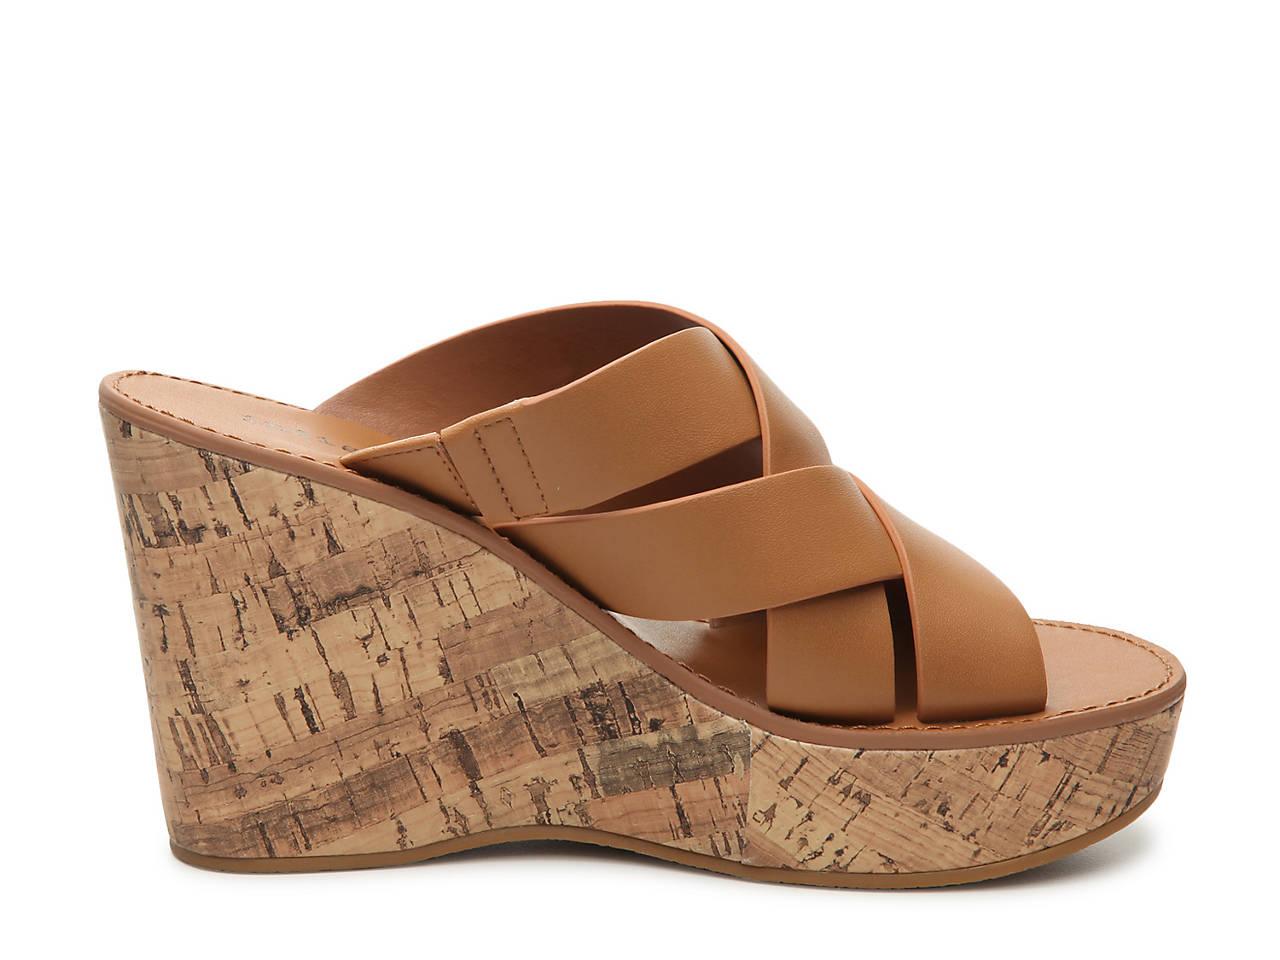 829058d4afb2 Indigo Rd. Vechi Wedge Sandal Women s Shoes